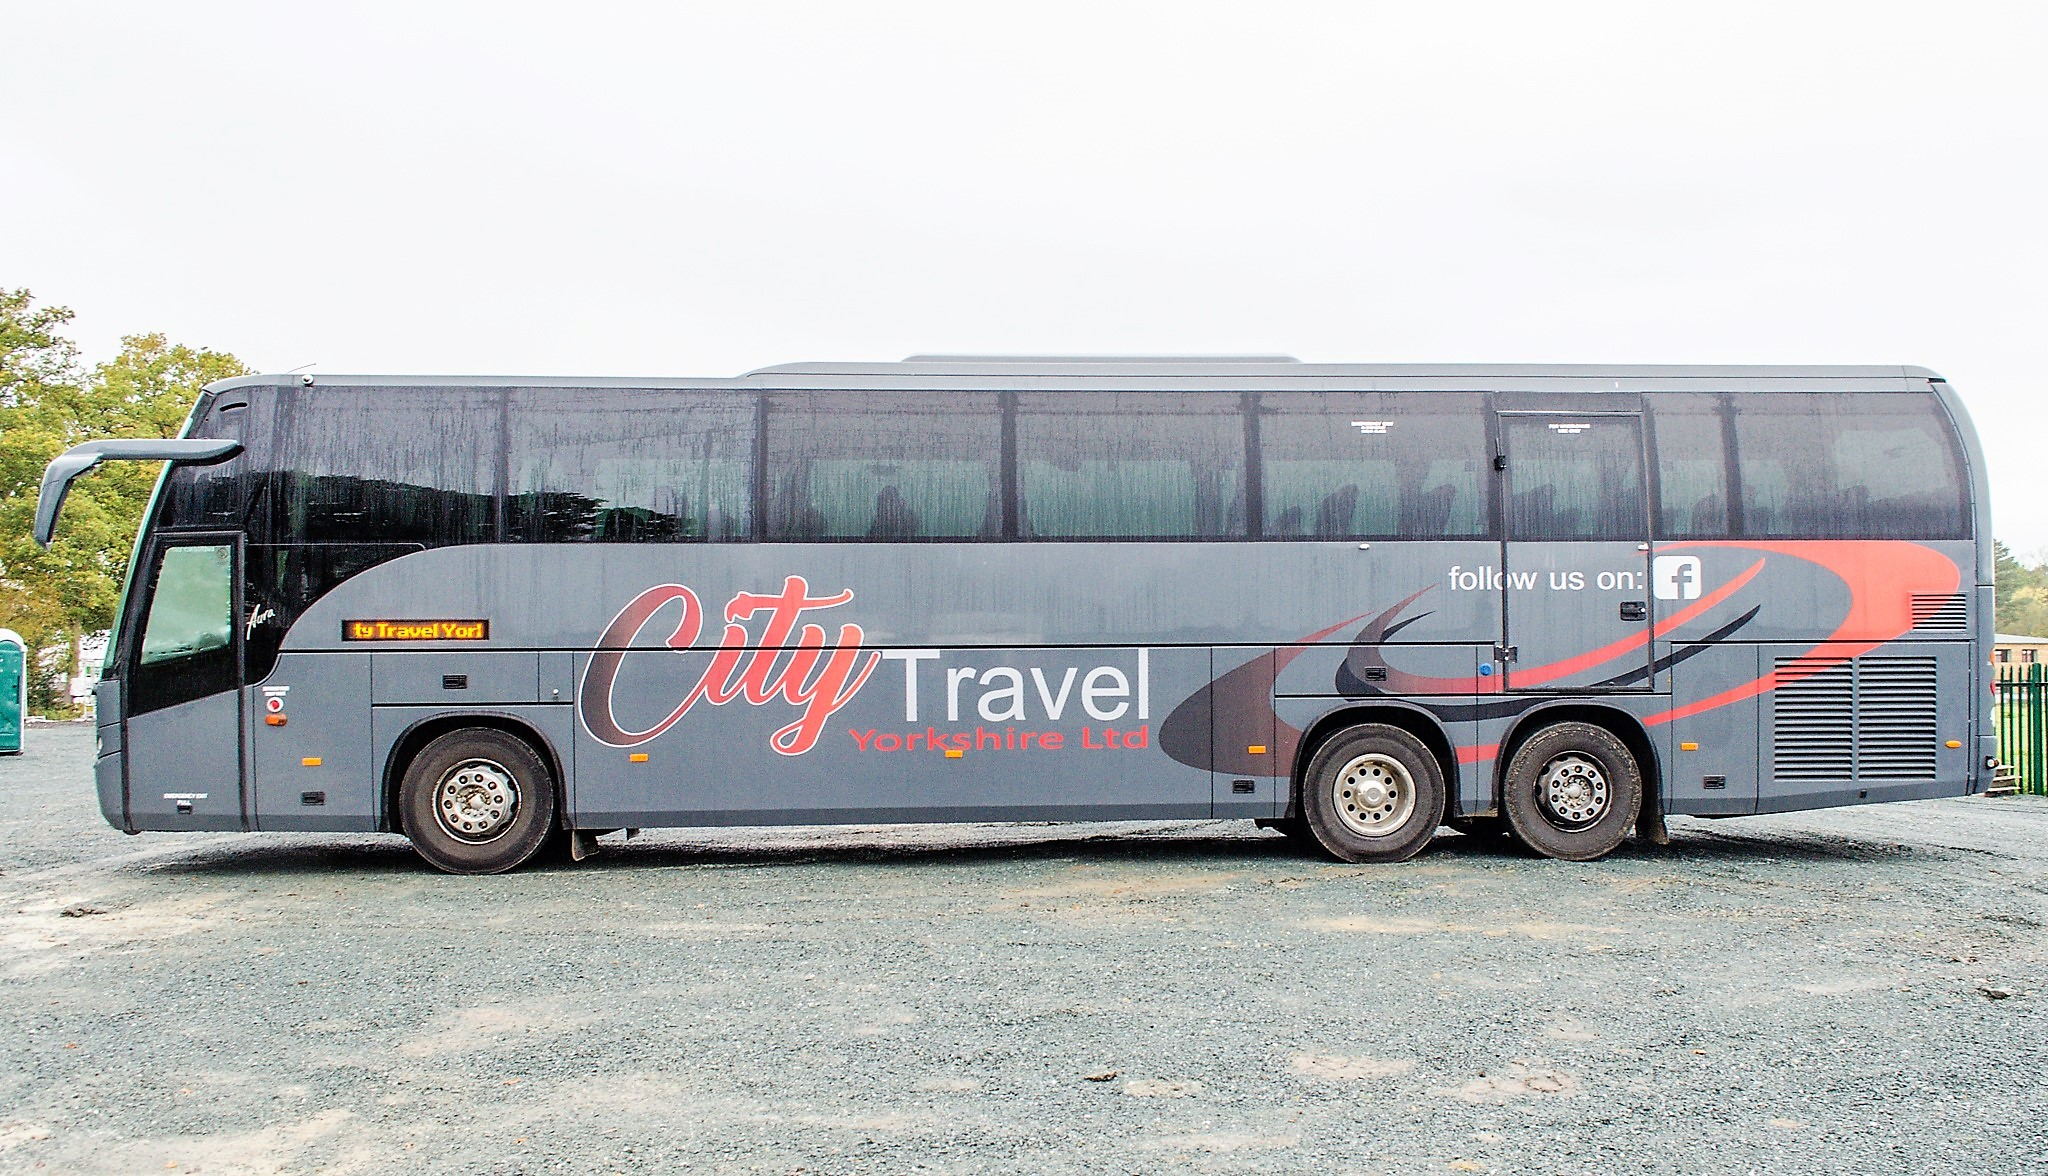 MAN F2000 Beulas Aura 54 seat luxury coach Registration Number: KC08 KTC Date of Registration: 30/ - Image 7 of 19